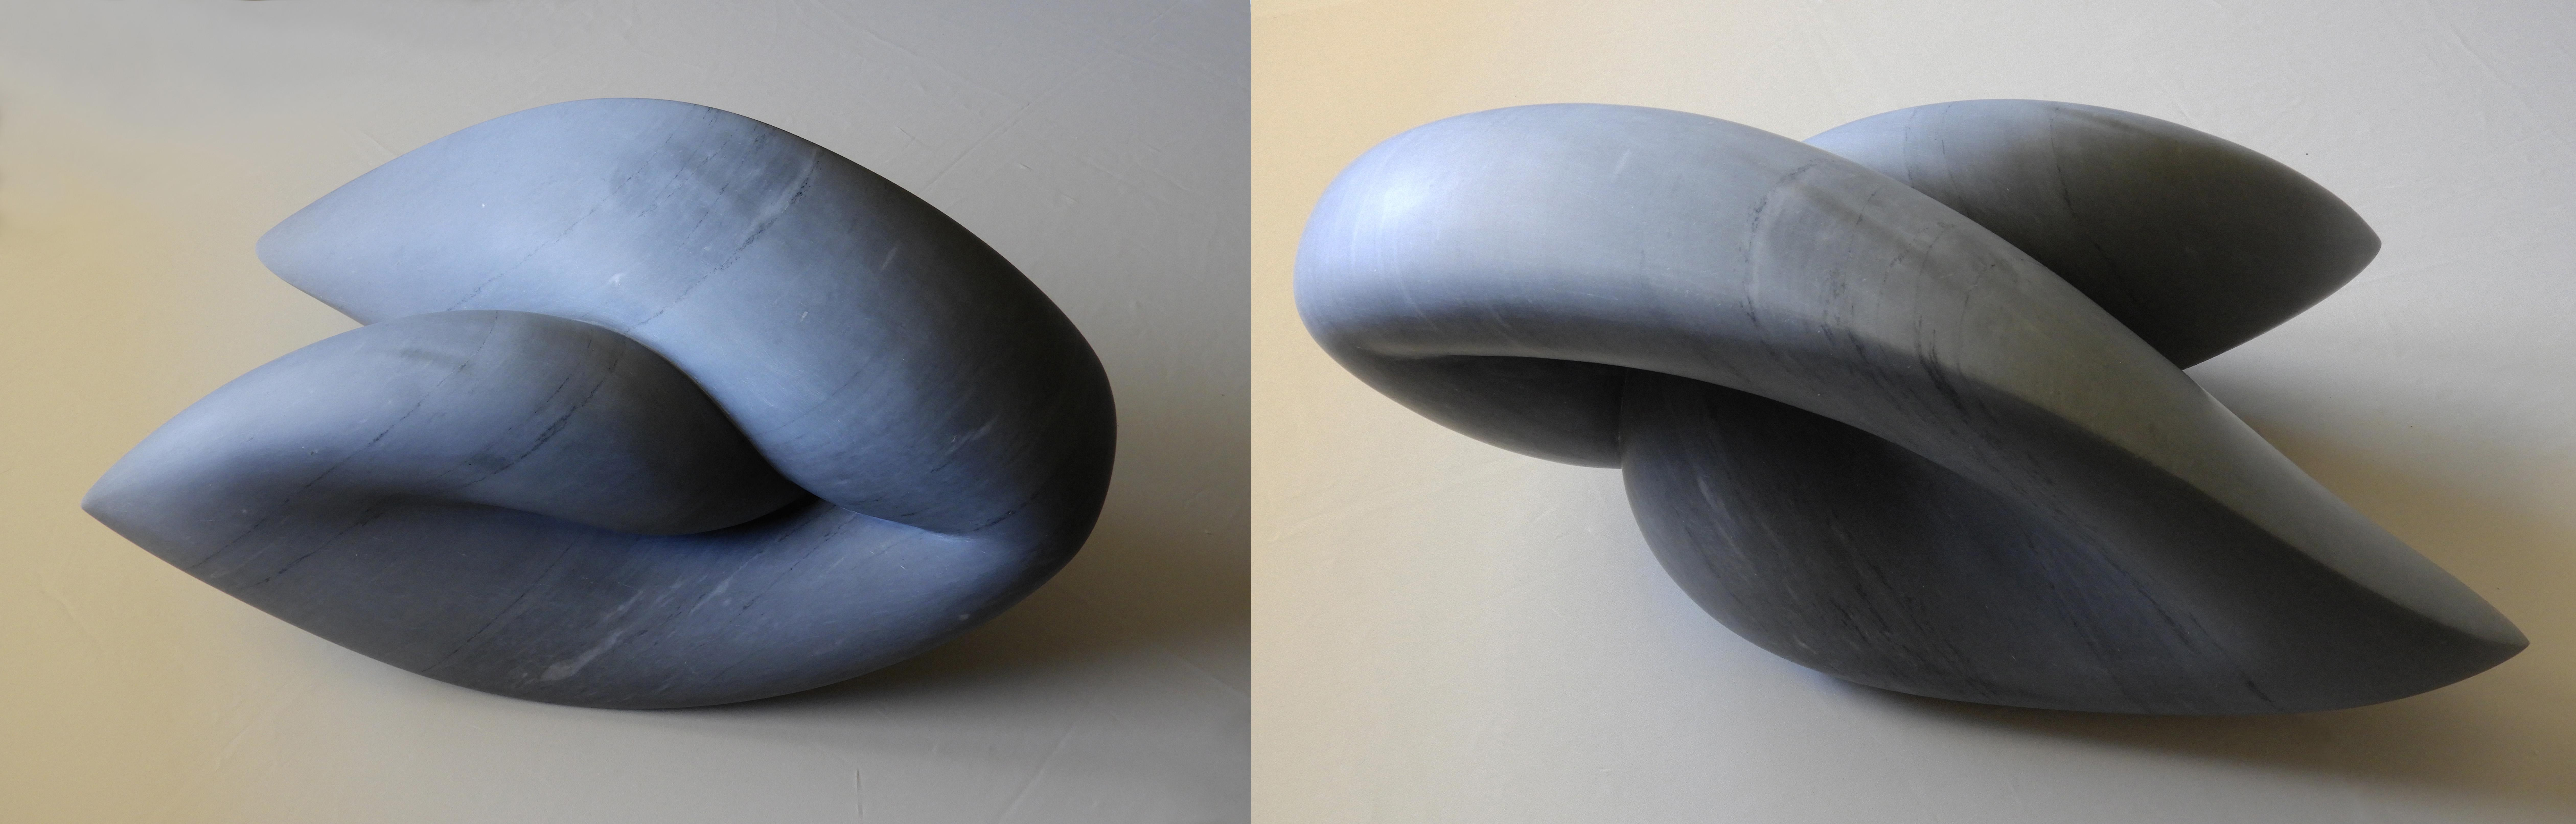 Symbiosis - h 25 x 60 x 29 cm  bardiglio marble  2019